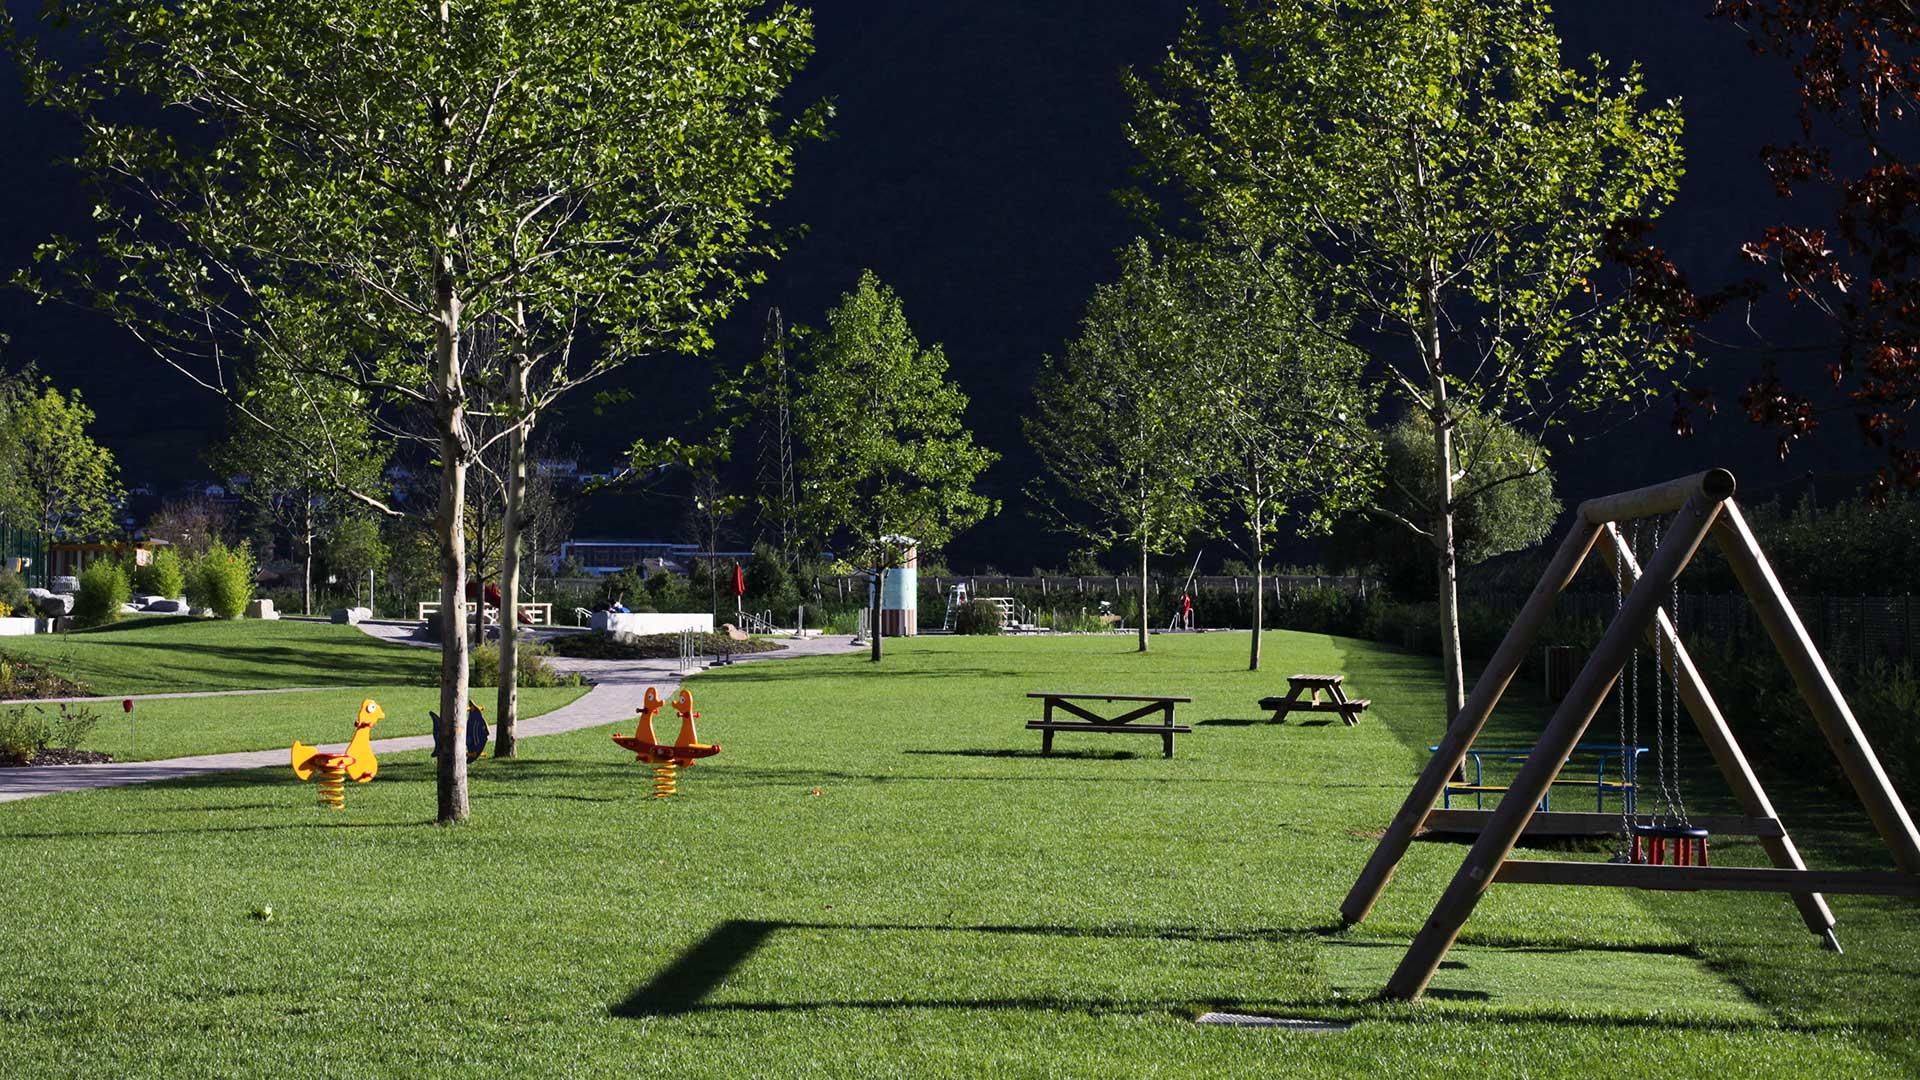 Parco giochi a Gargazzone